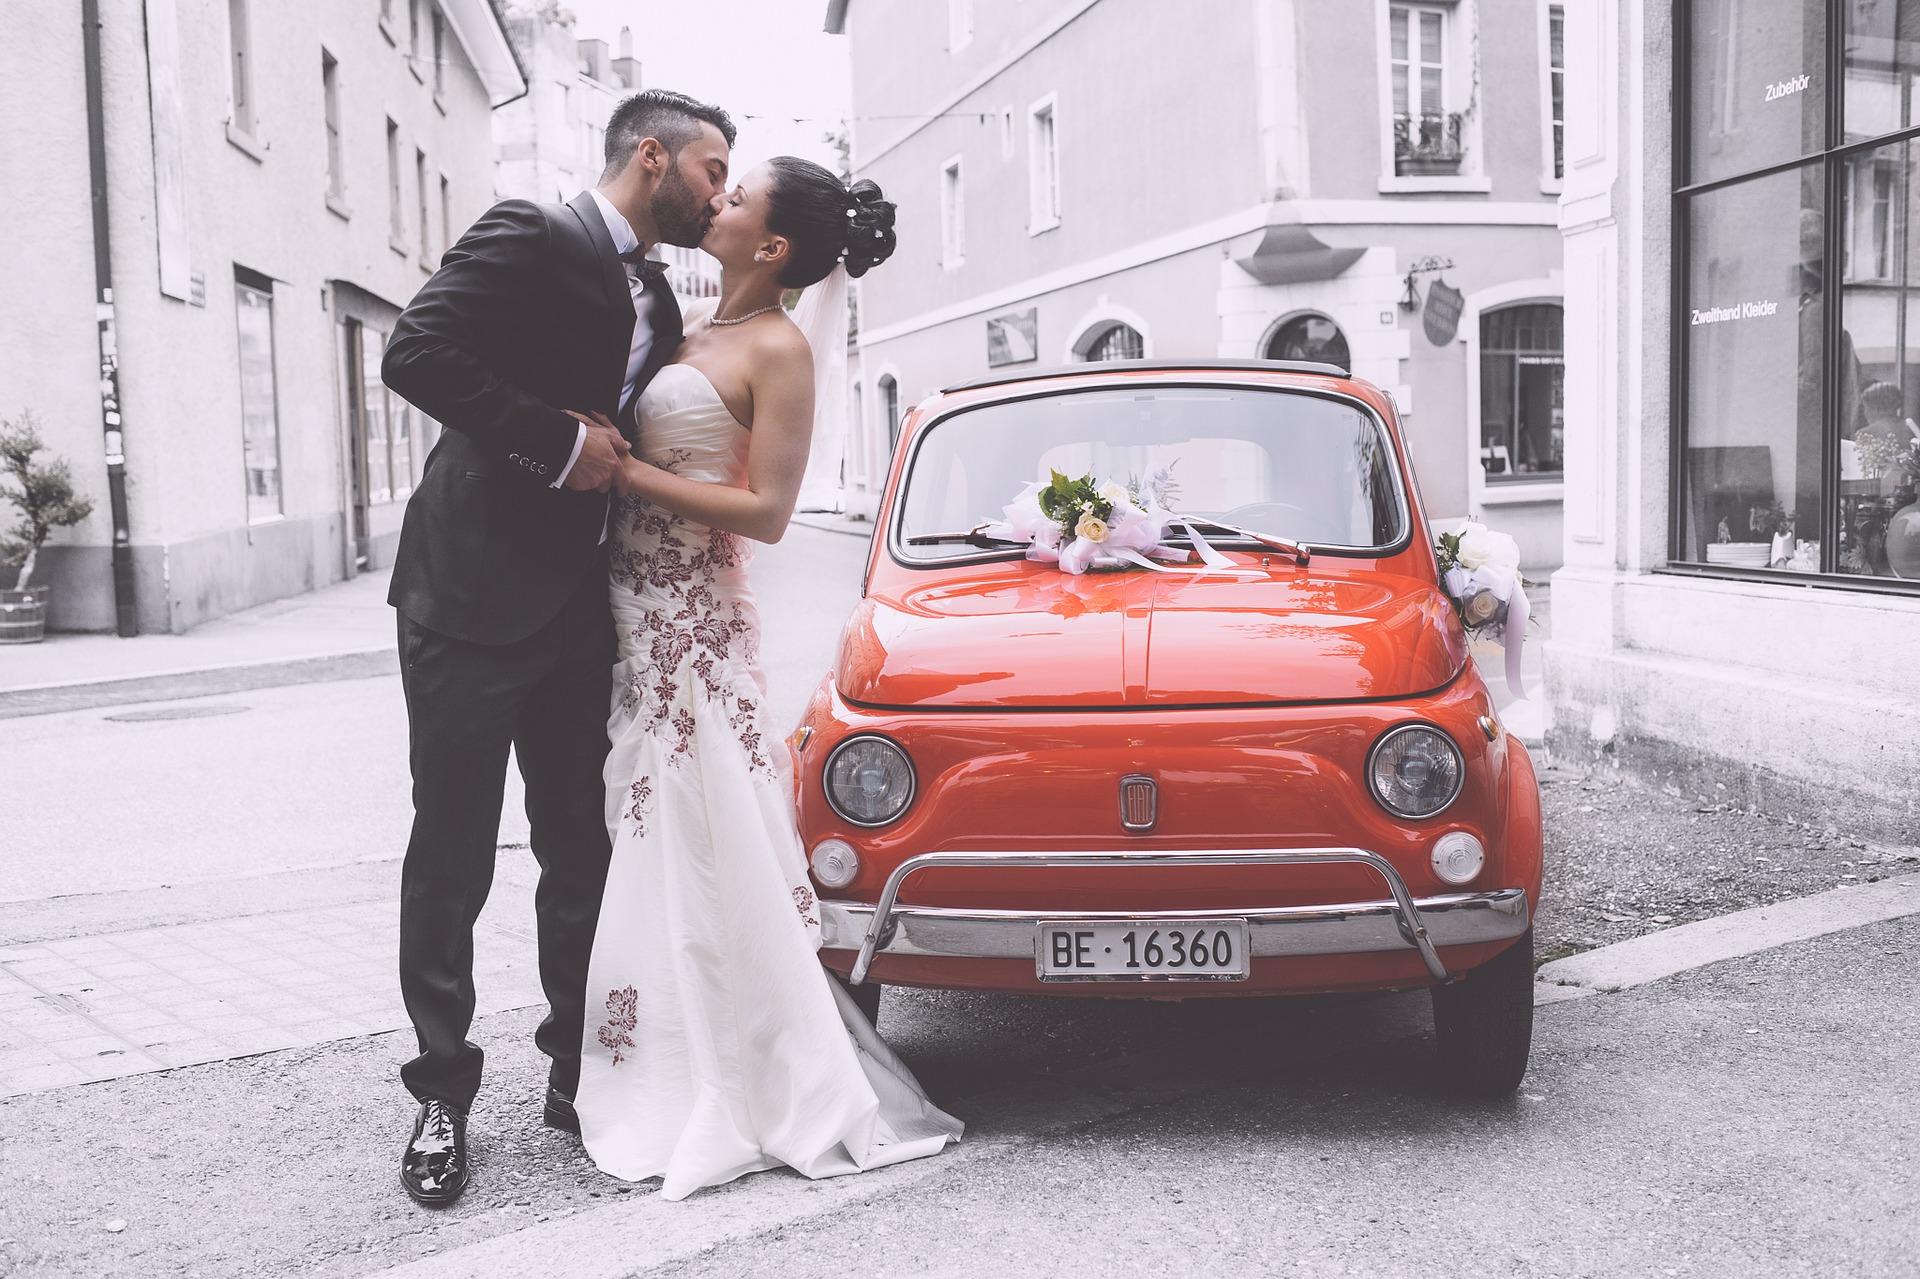 3 European Destinations for a Romantic Honeymoon